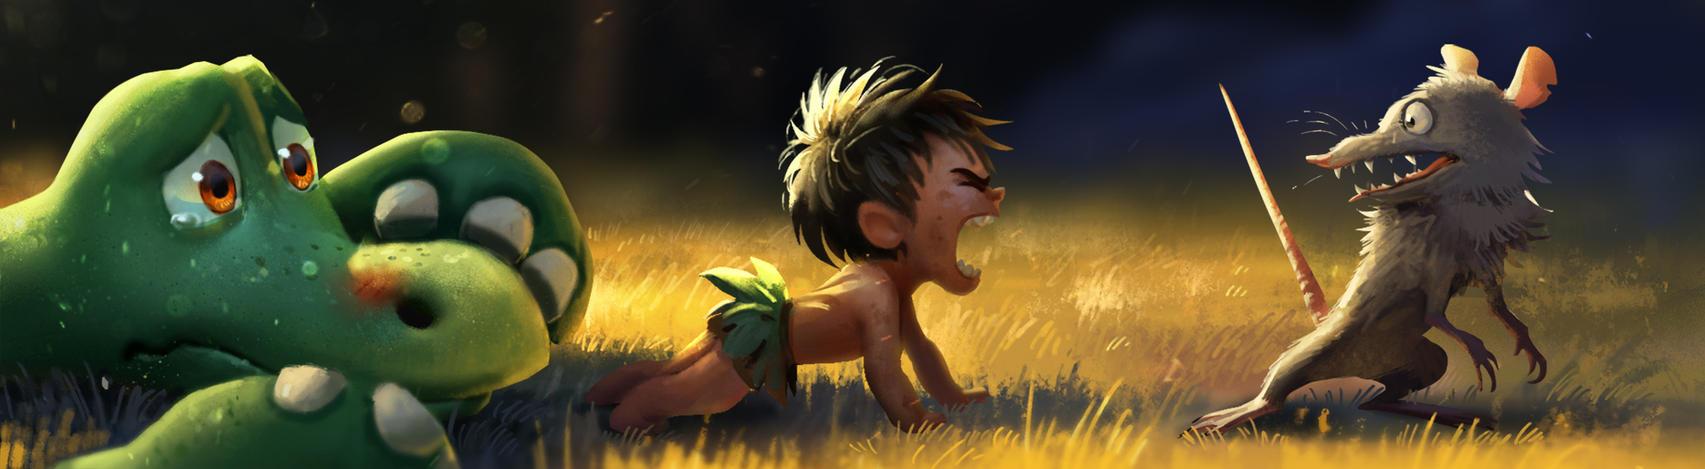 The Good Dinosaur by Detkef